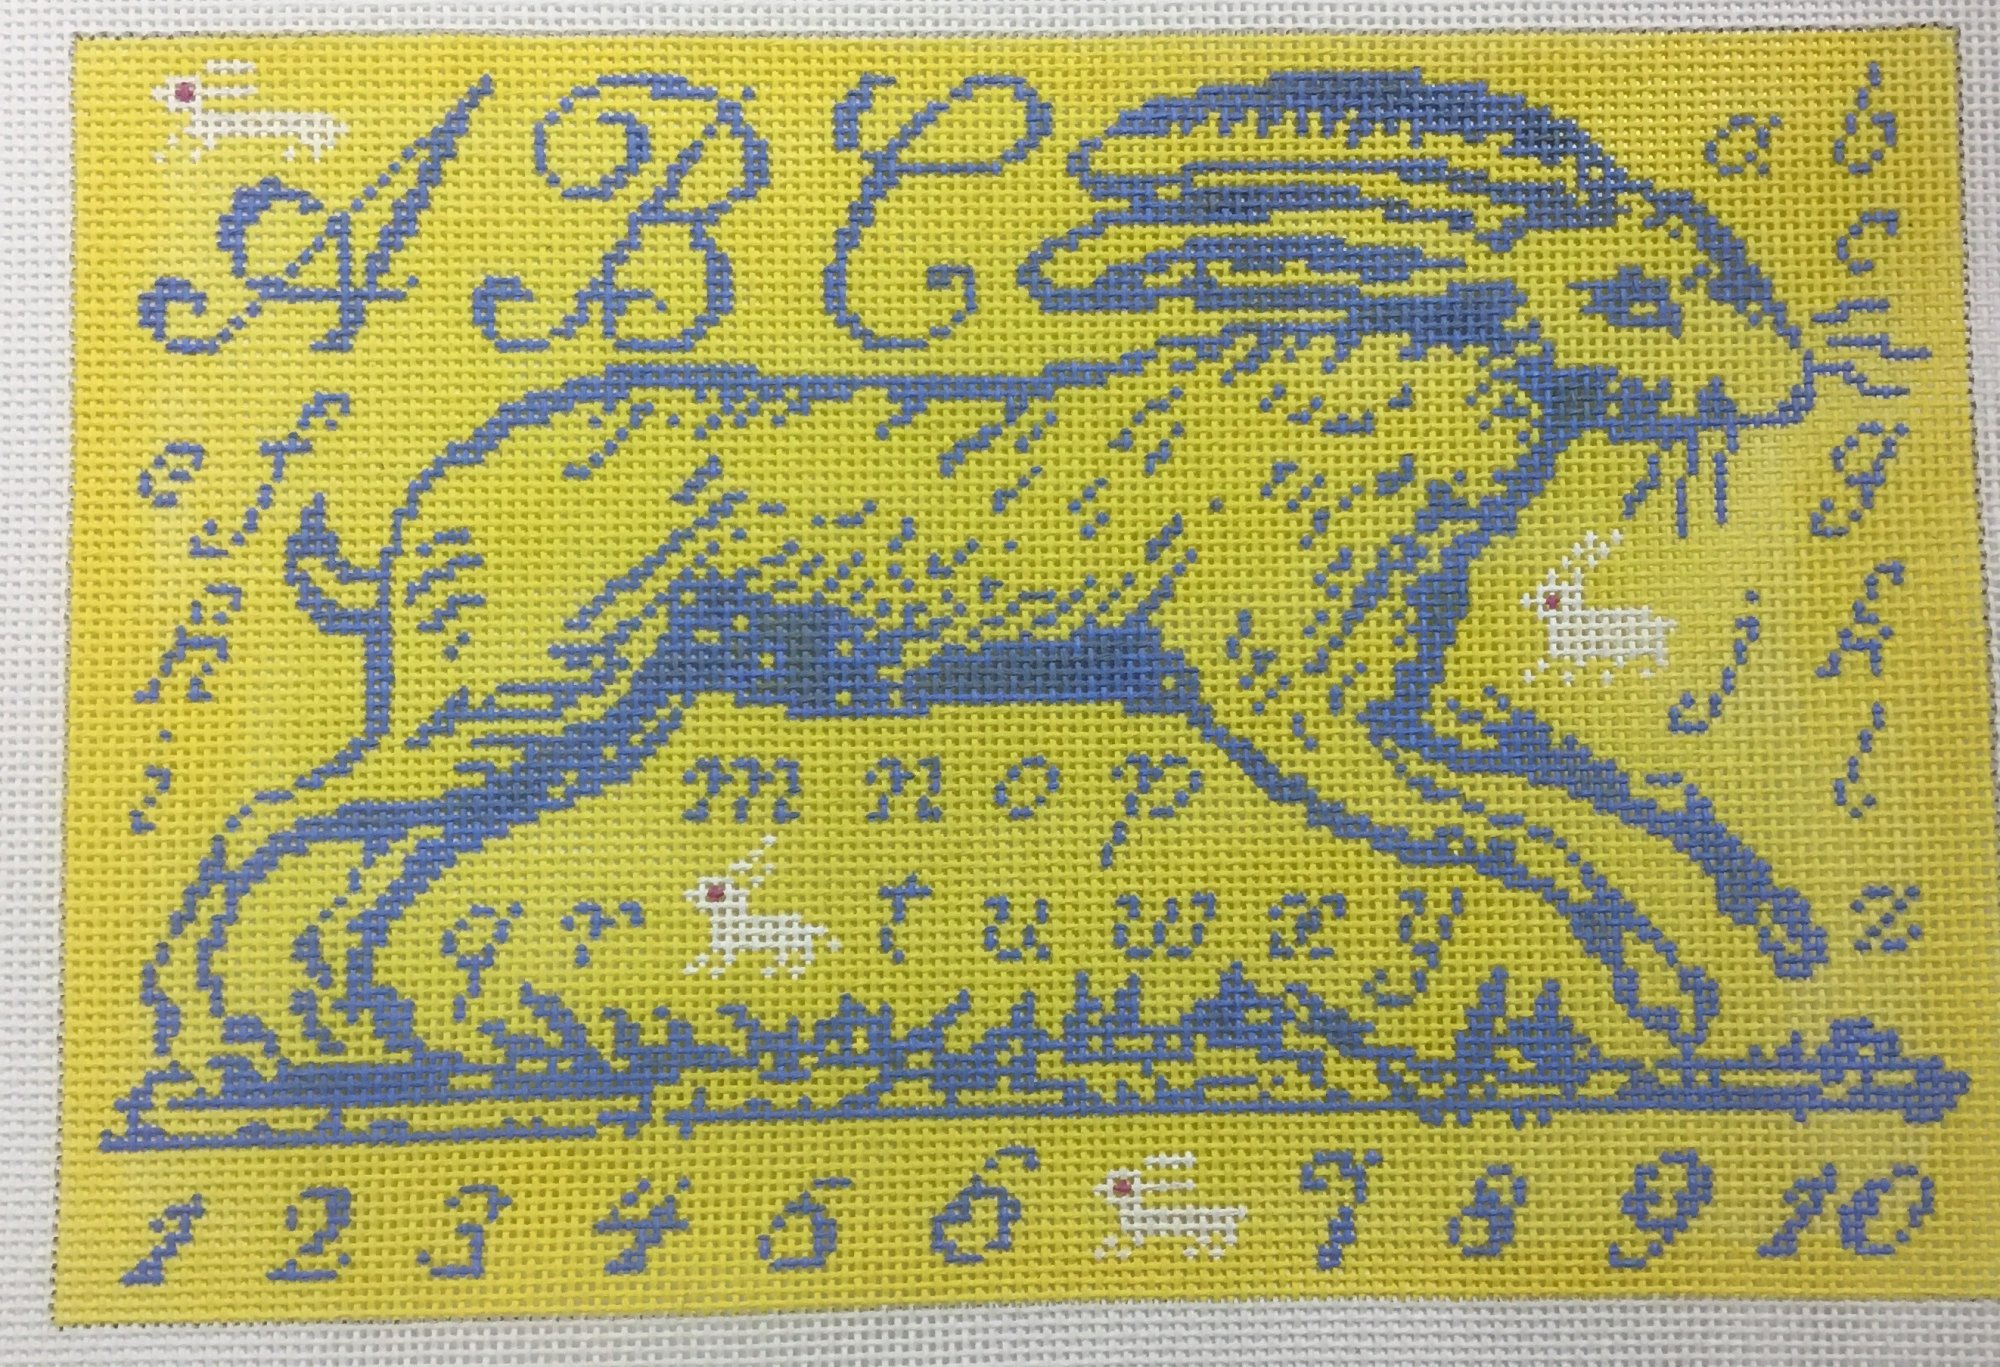 Blue Rabbit on Yellow,13 ct.,7 1/2x11